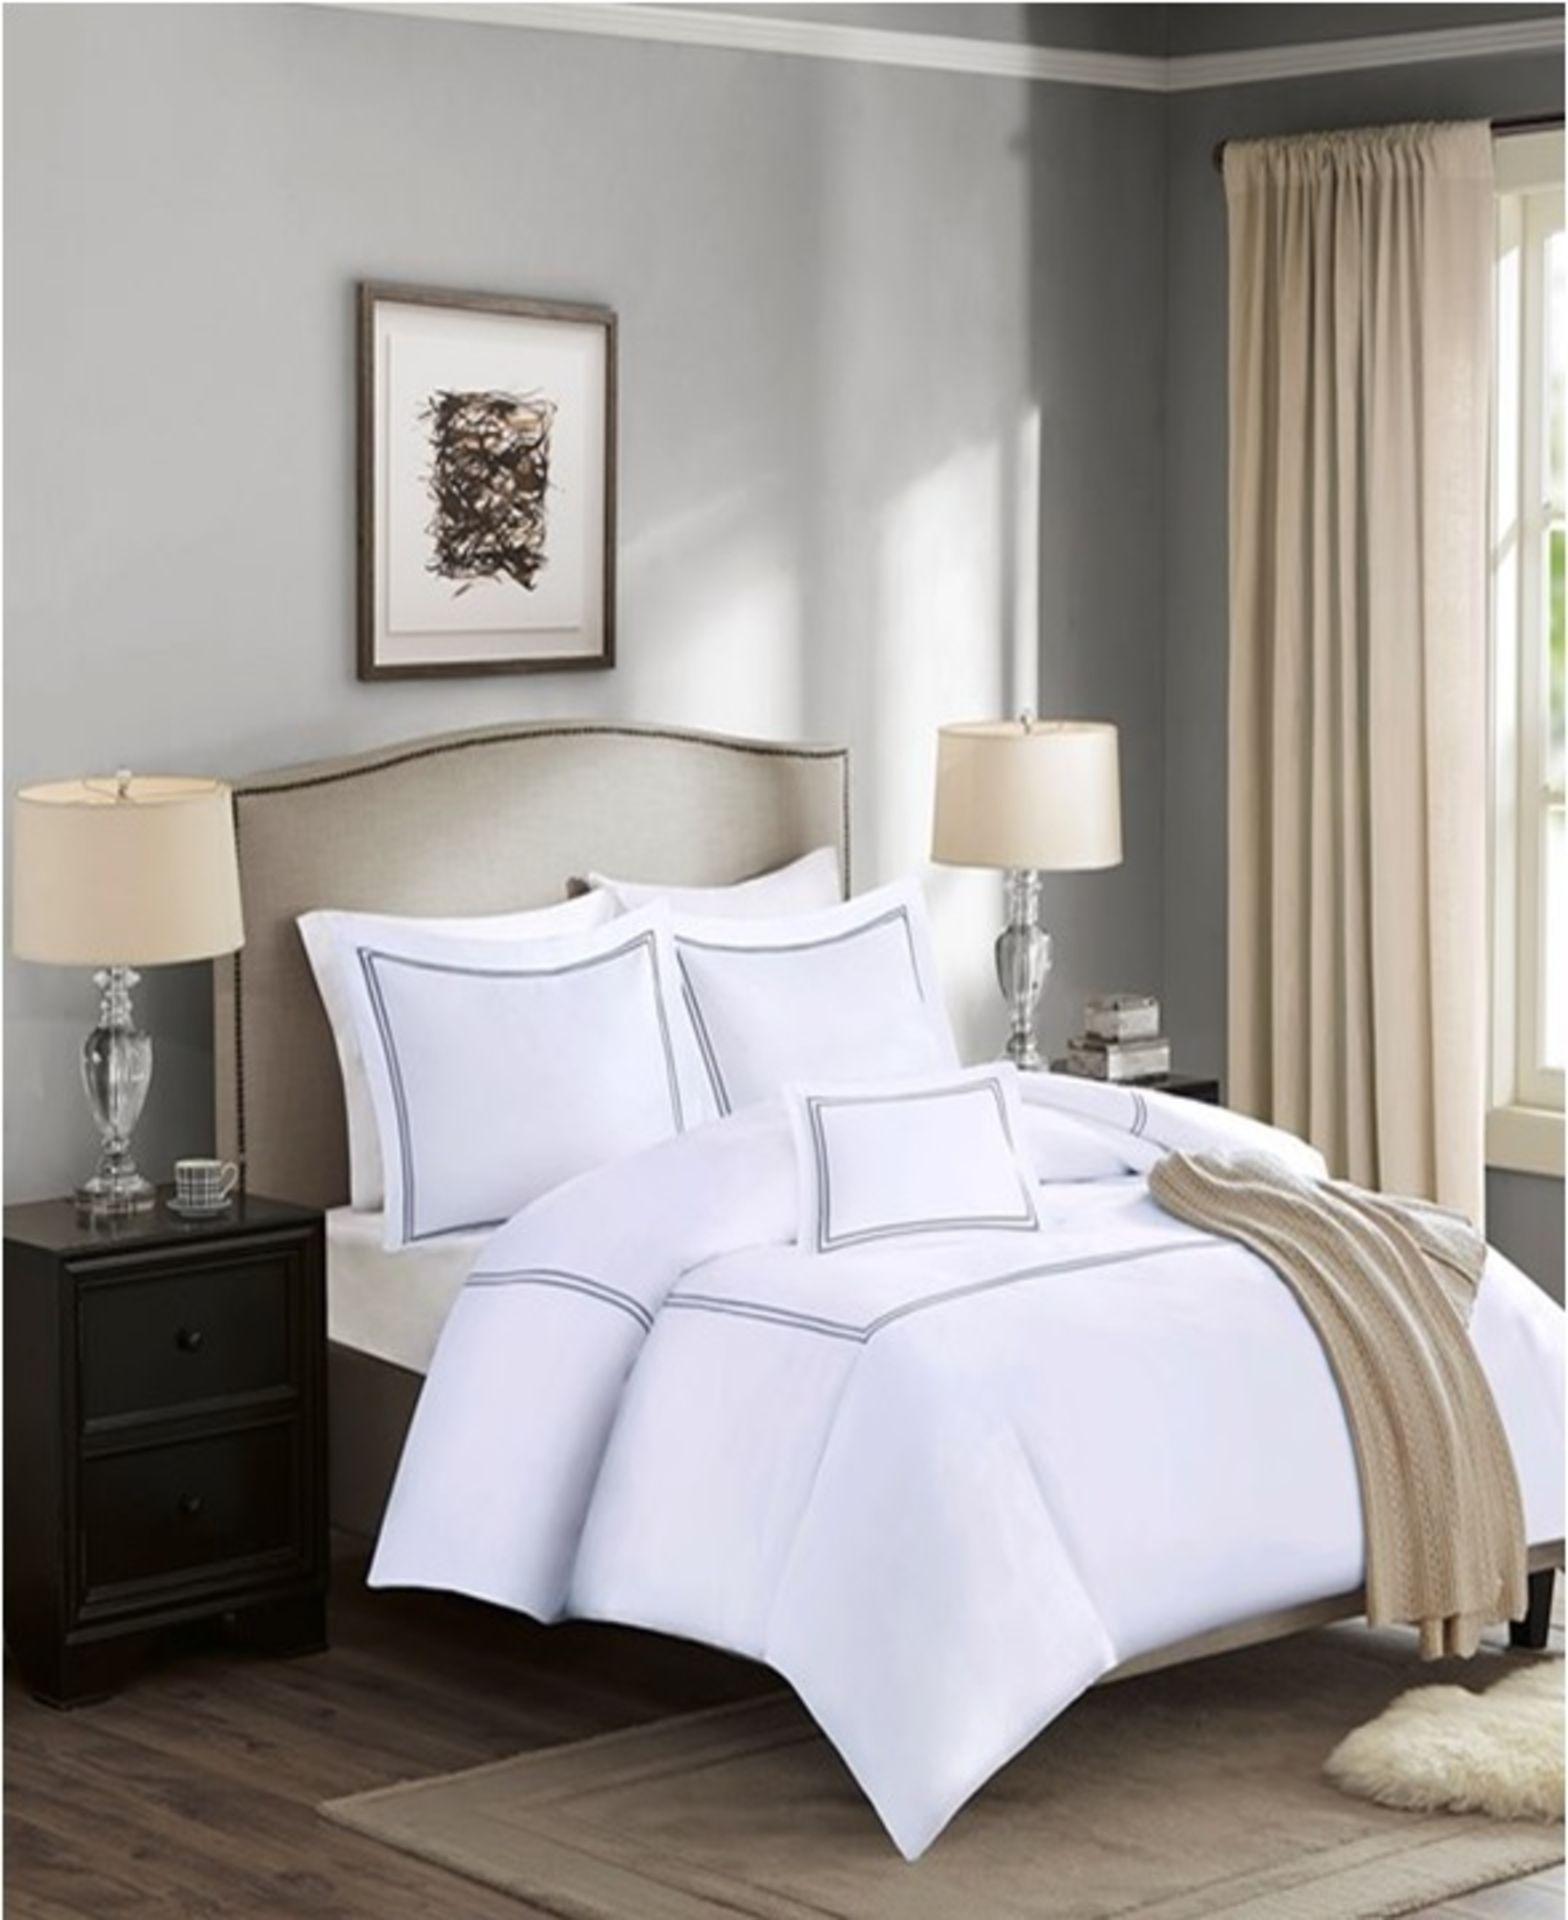 Lot 137 - 1 x Madison Park Luxury Collection Single Duvet Set White - Product Code MP12-0197UK (Brand New -